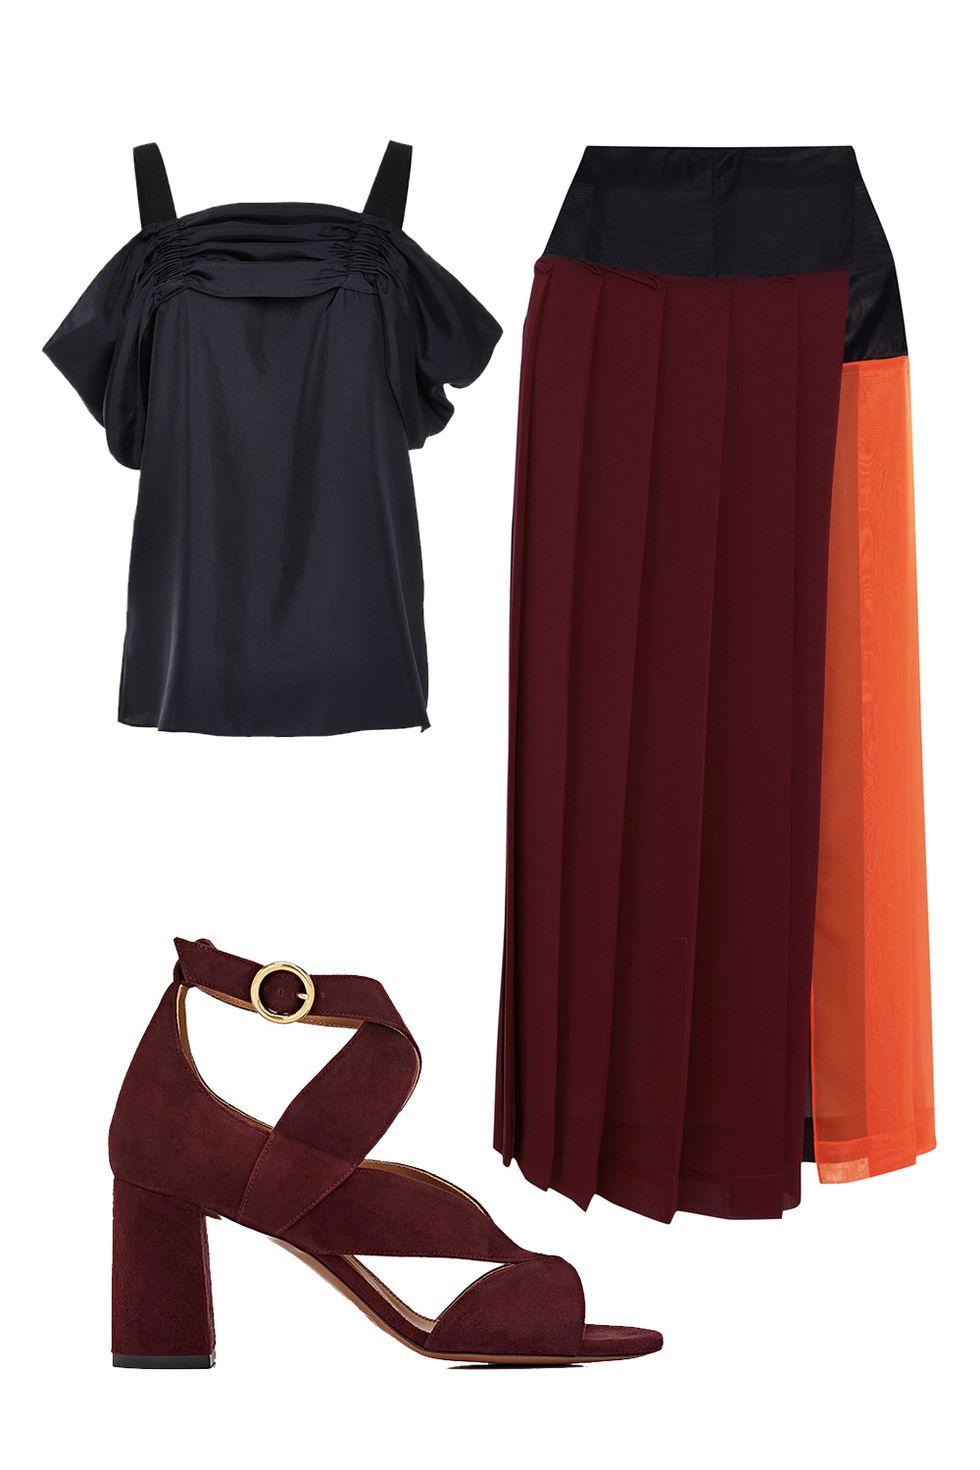 burgundy-midi-skirt-pleated-burgundy-shoe-sandalh-black-top-offshoulder-colorblock-fall-winter-thanksgiving-outfits-holidays-dinner.jpg